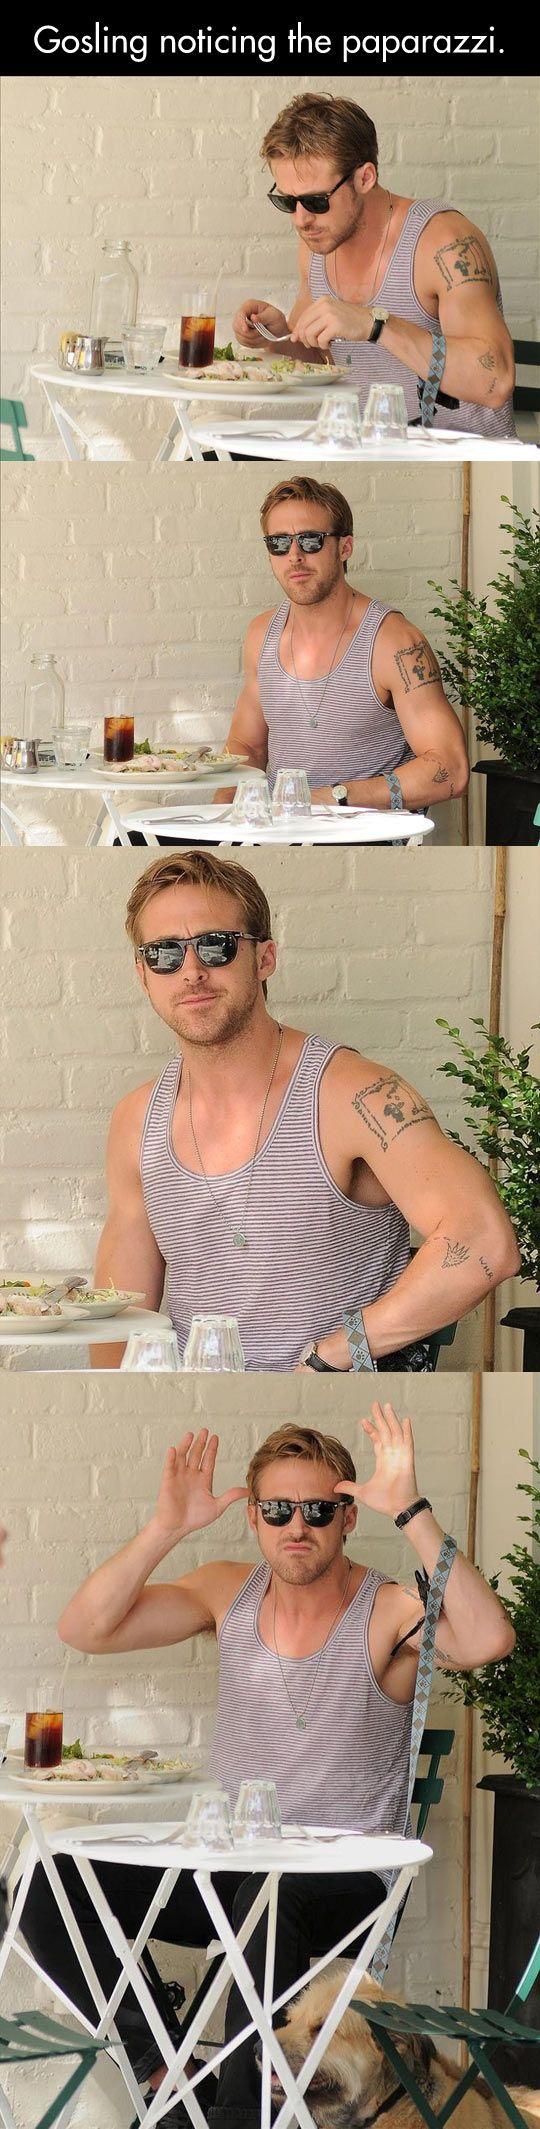 How Ryan Gosling handles the paparazzi.